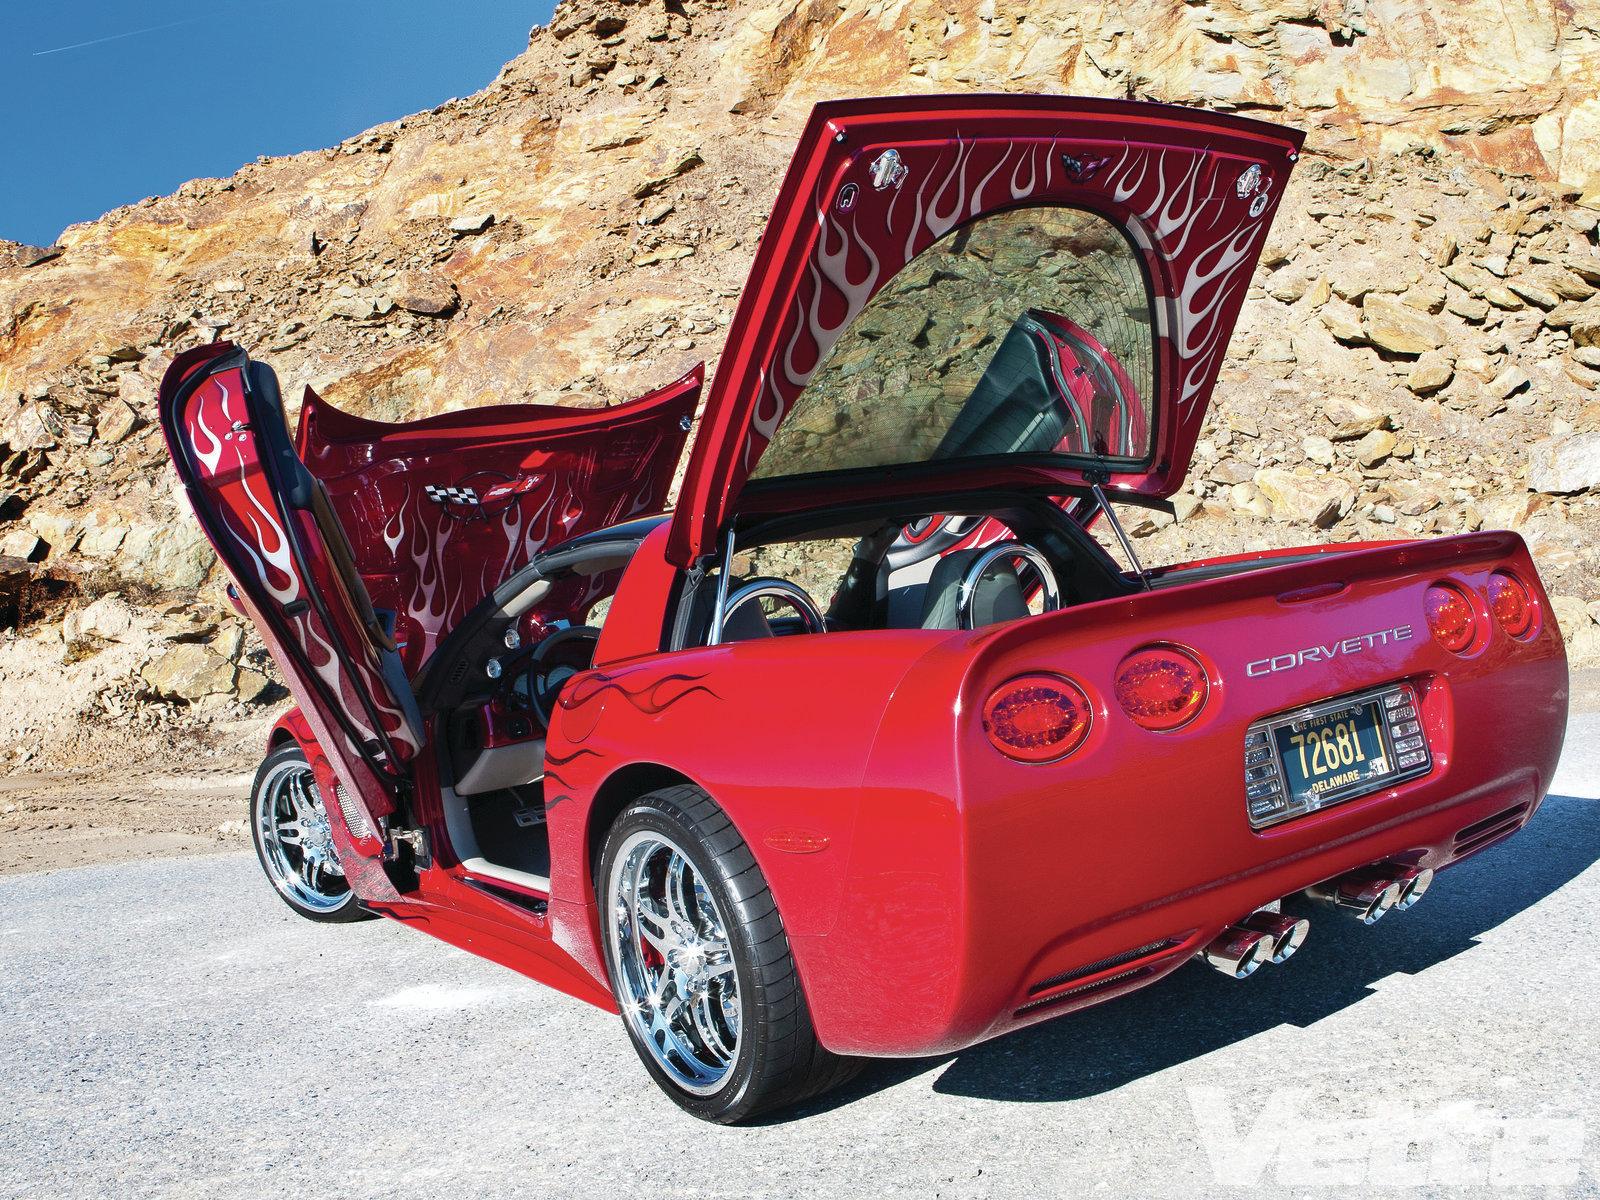 Chevrolet Chevrolet Corvette Classic Car Hot Rod Muscle Car 1600x1200